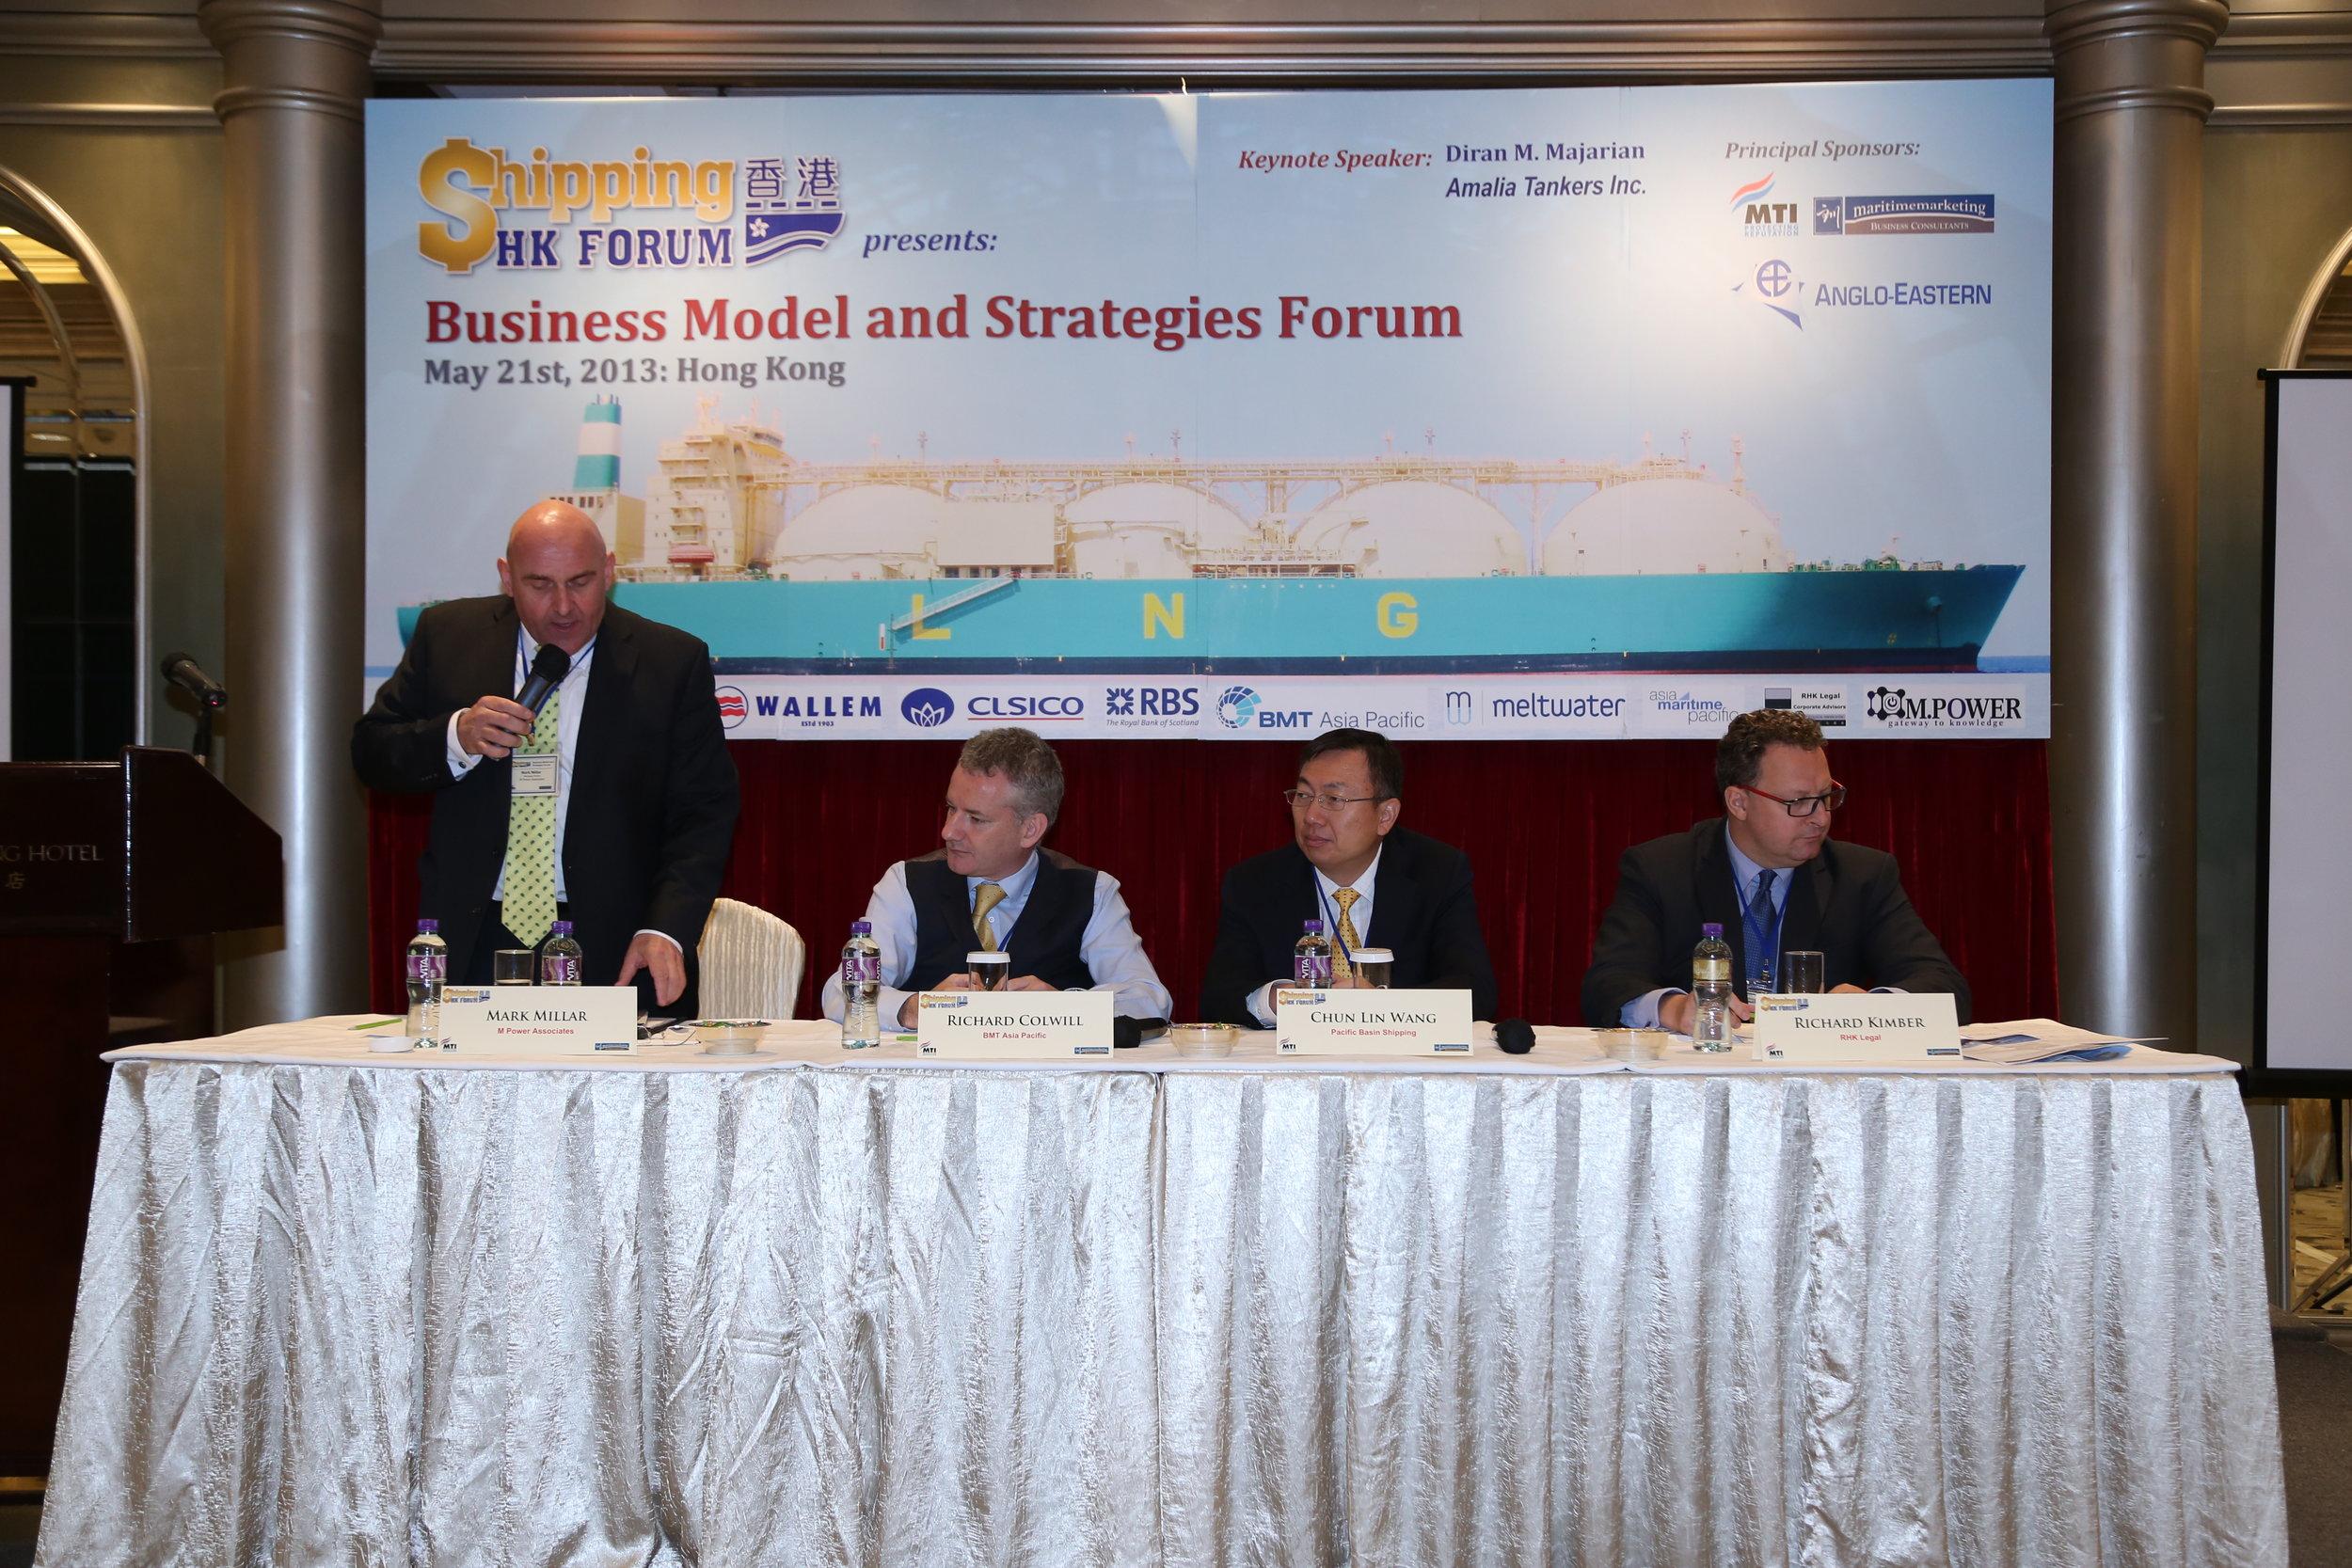 2013-05 HKG Shipping Forum-Ferdi@Regal Hotel (19).JPG